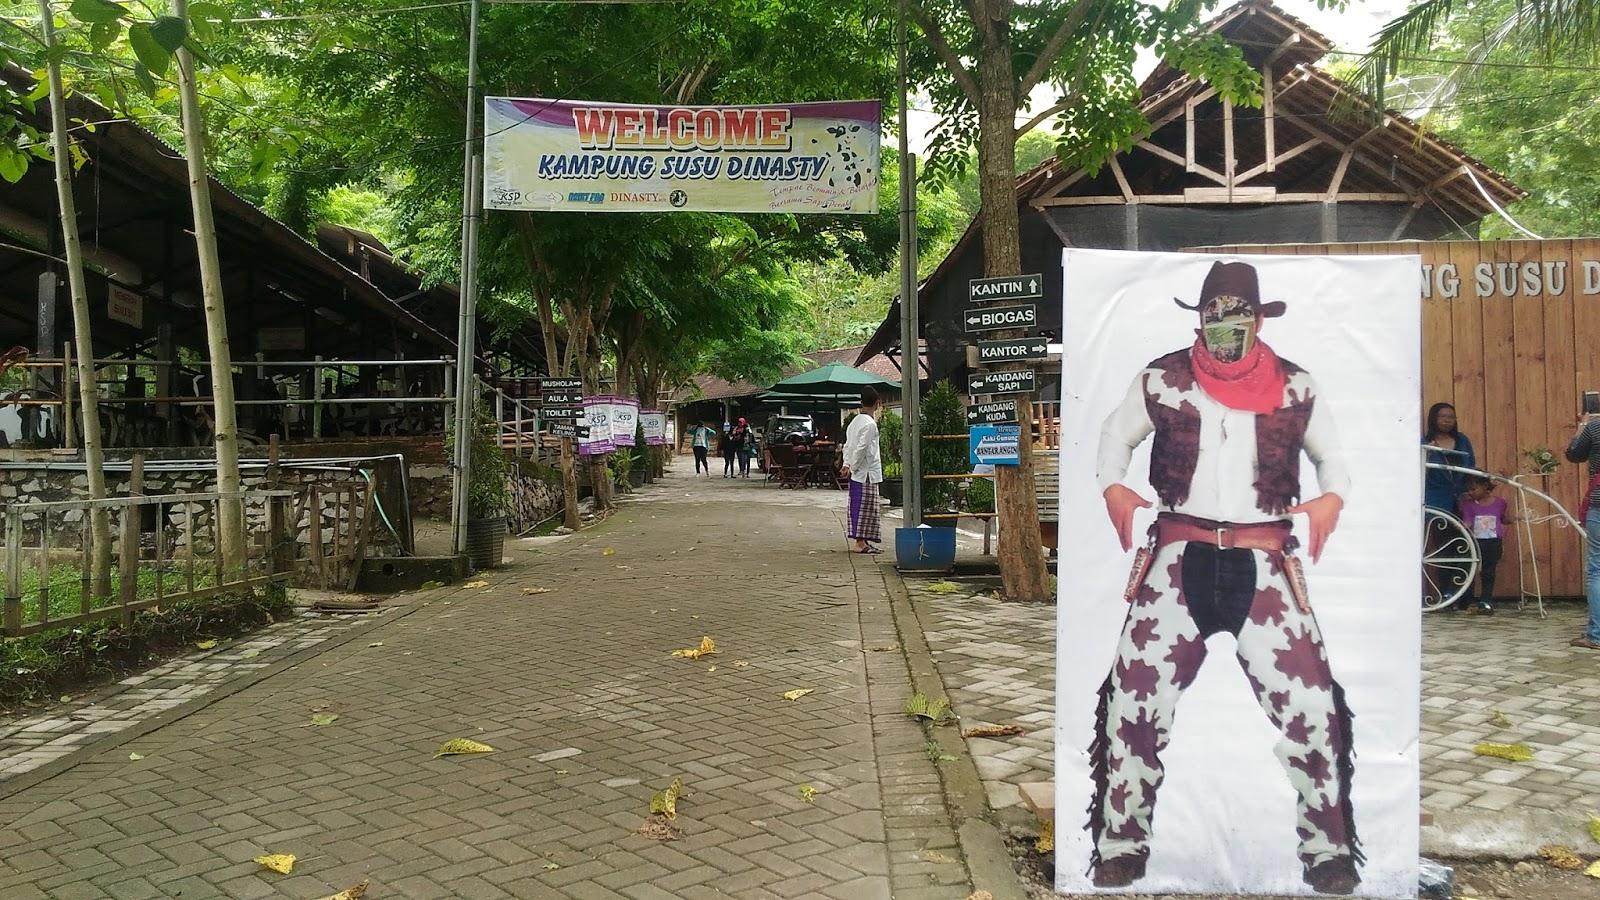 World Adventure Destination Kampung Susu Dinasty Kab Tulungagung